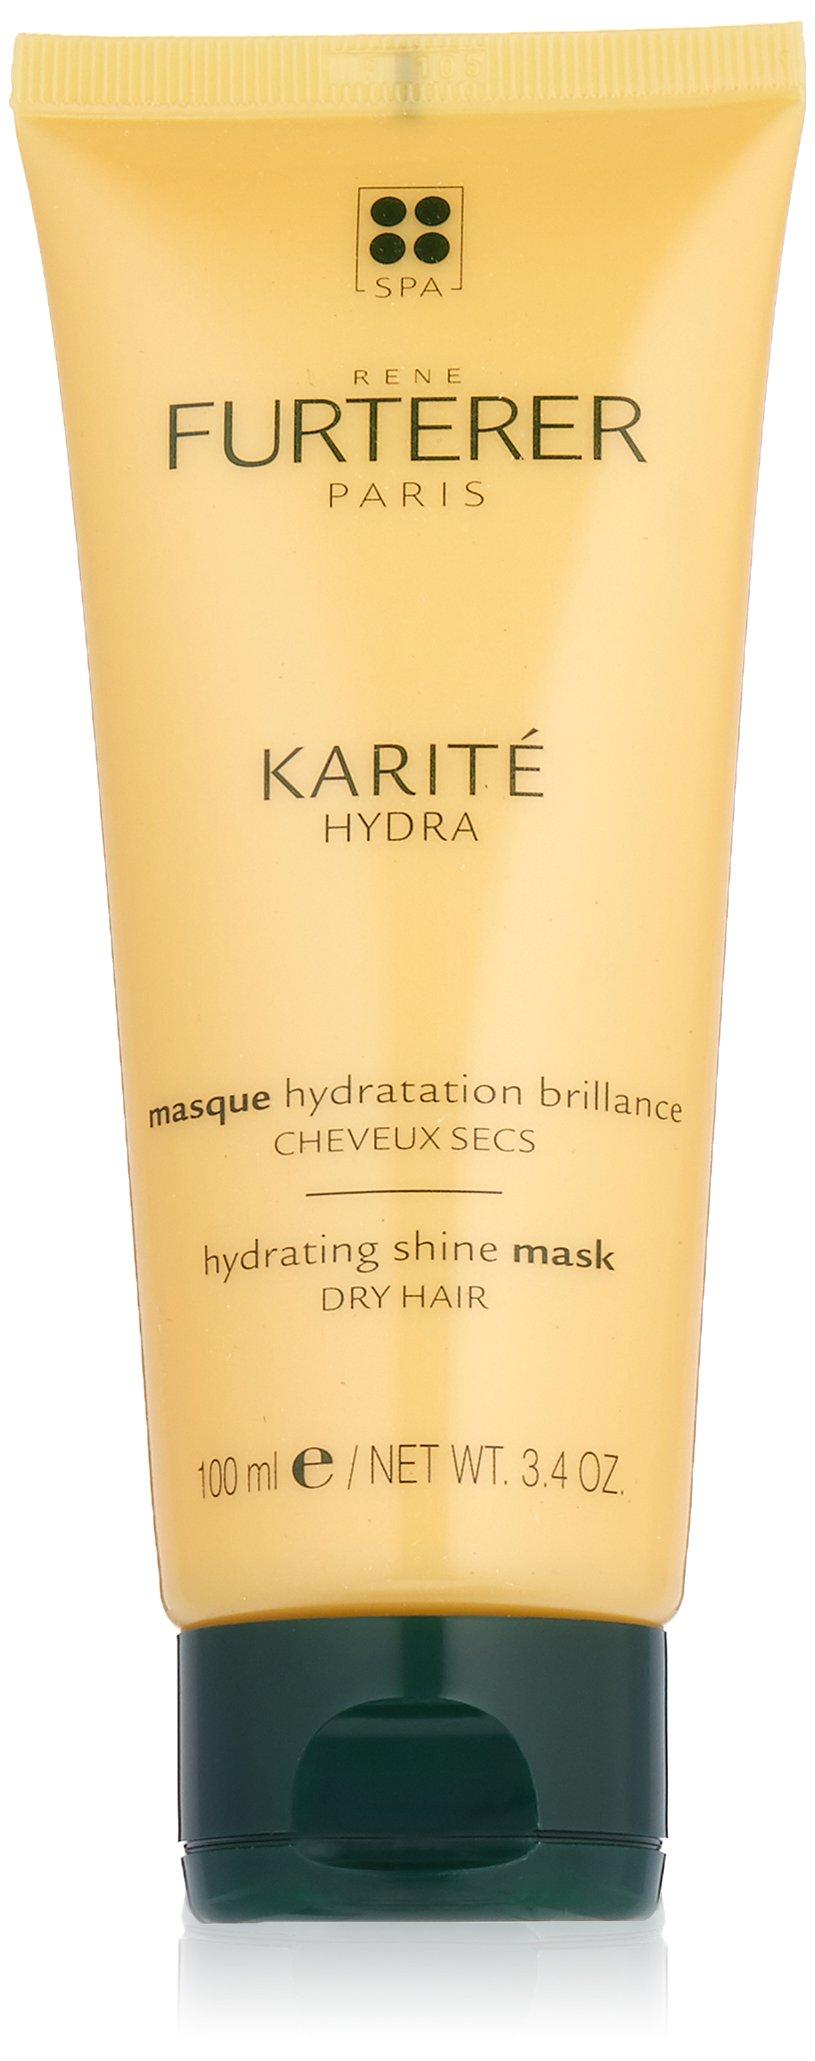 Rene Furterer KARITE HYDRA Hydrating Shine Mask, Normal to Dry Hair, Moisturizing, Shea Oil,  3 oz.